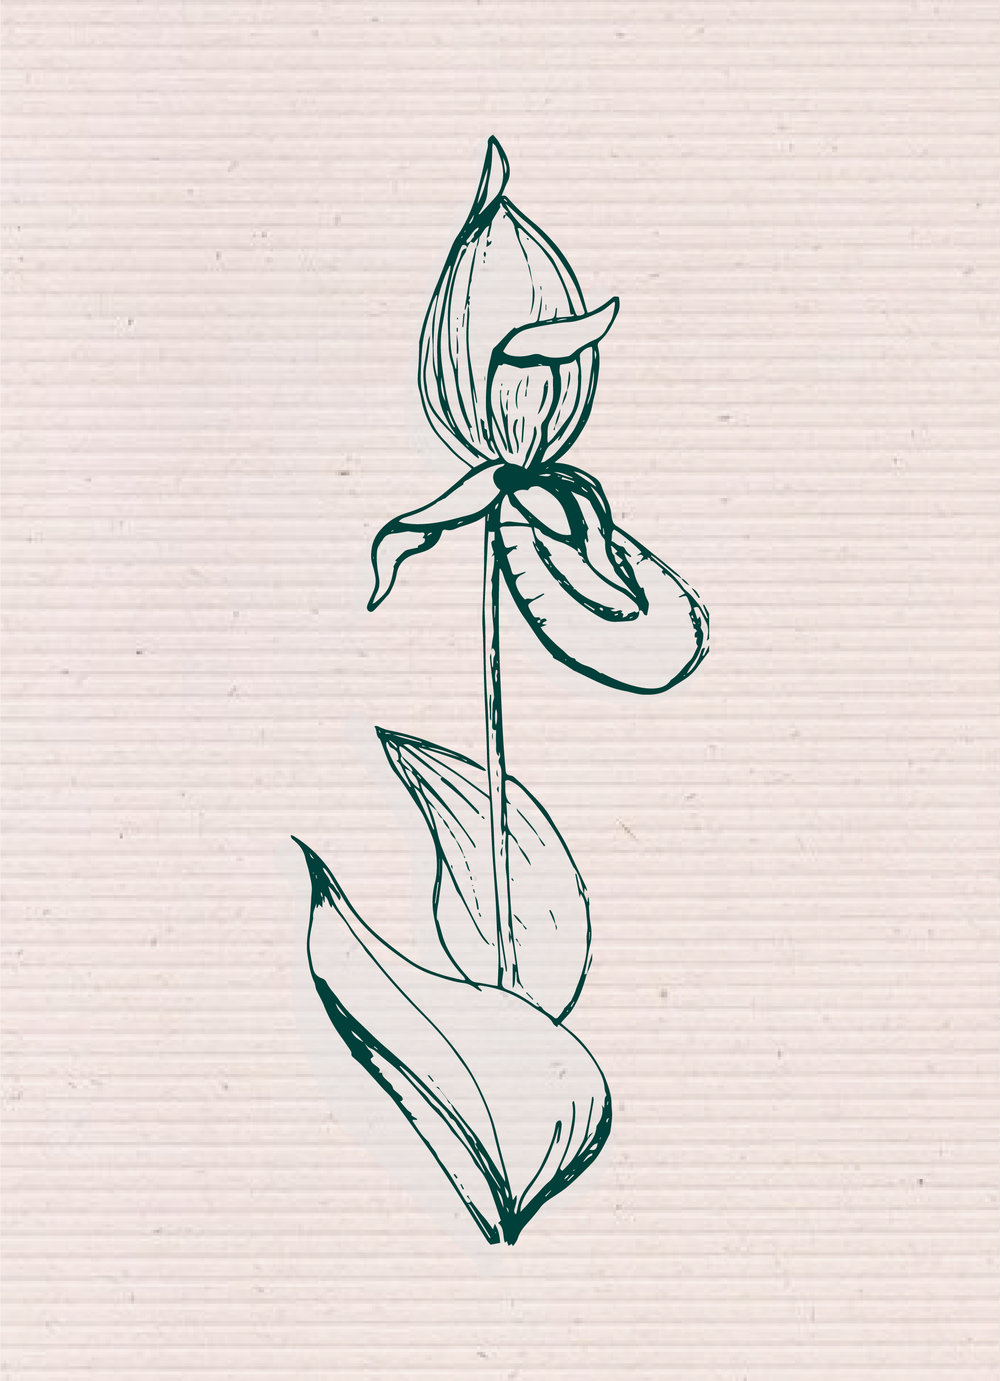 sketches-03.jpg